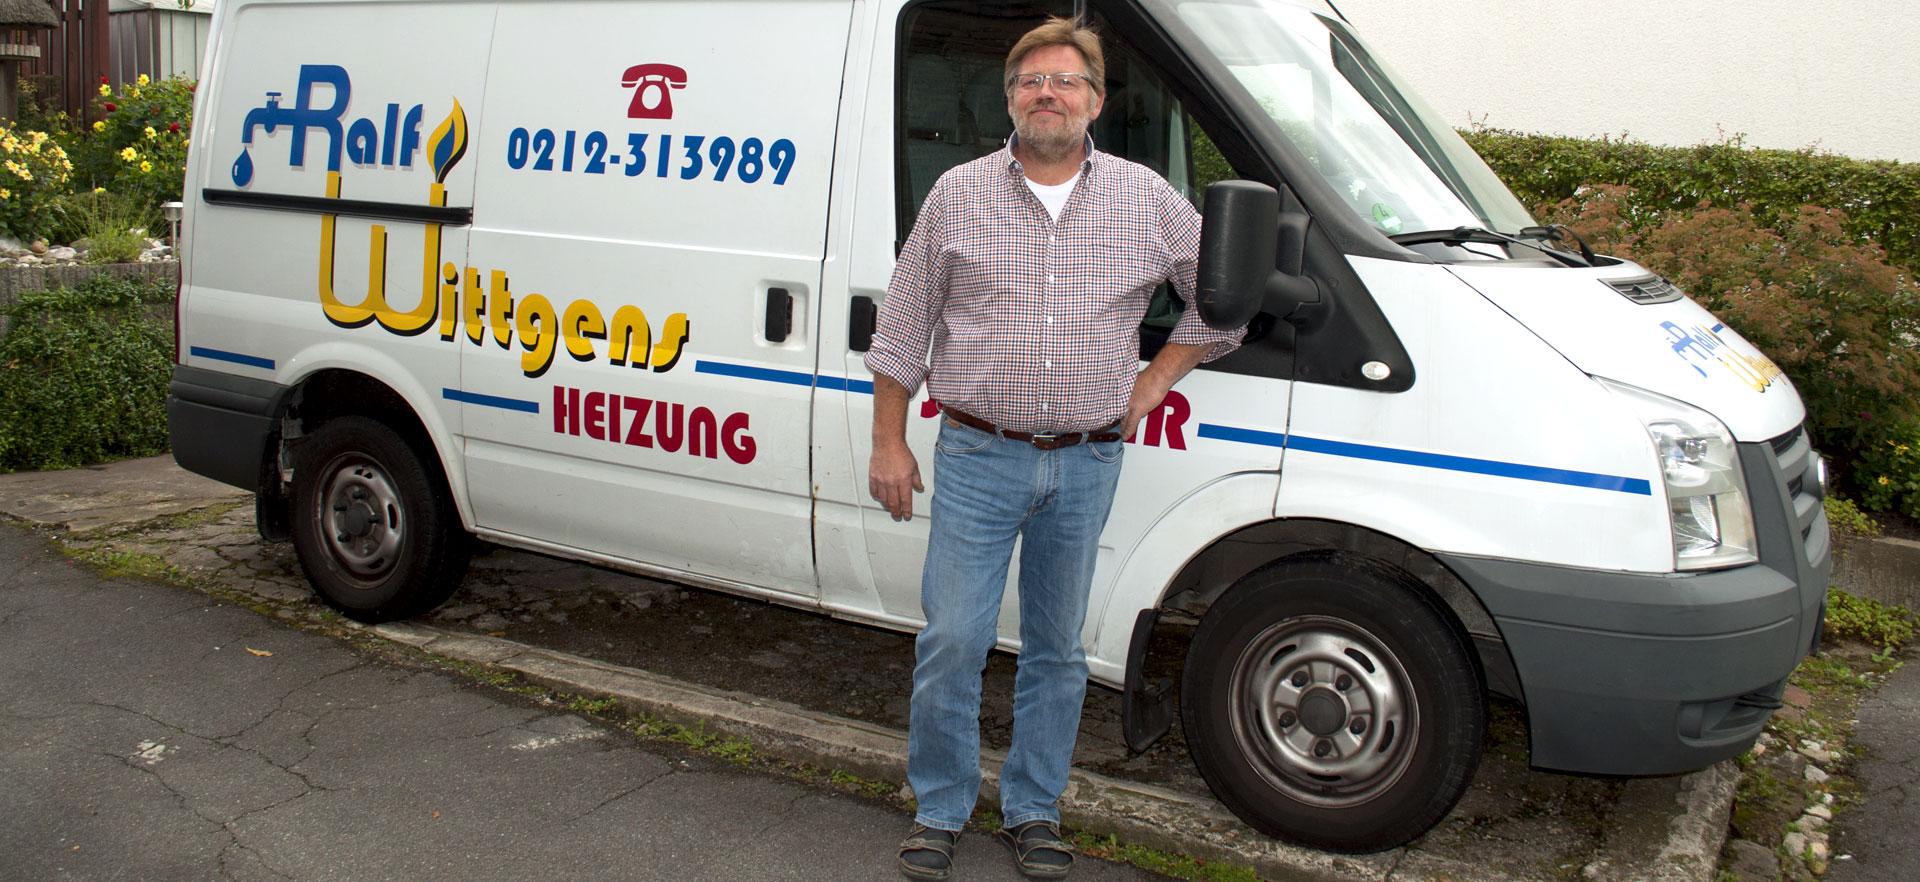 Ralf Wittgens